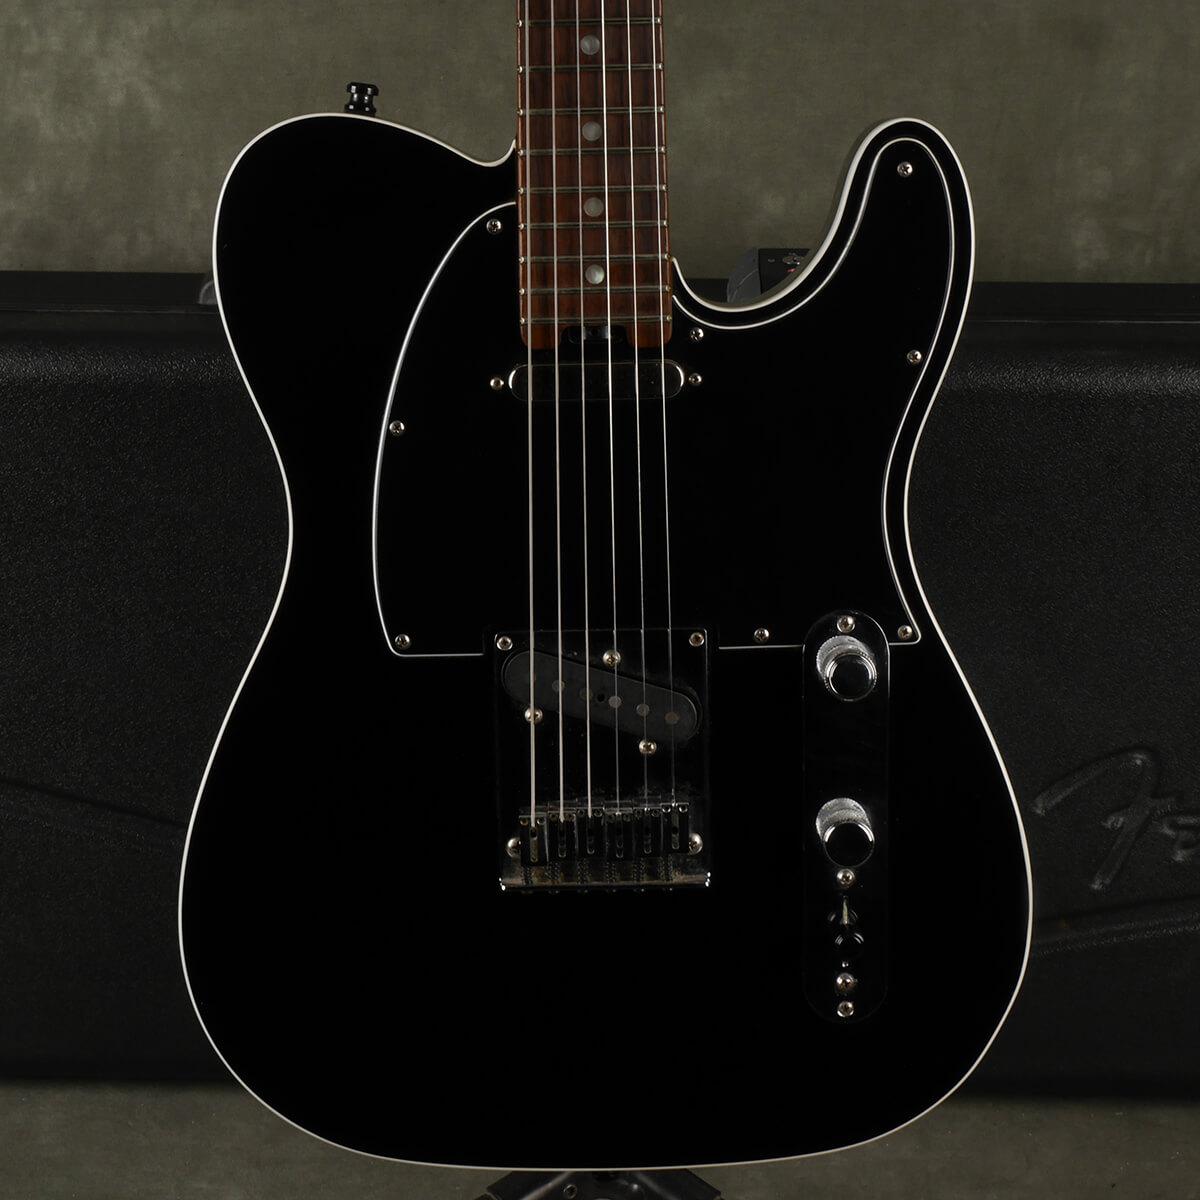 Fender American Elite Telecaster - Black w/Hard Case - 2nd Hand